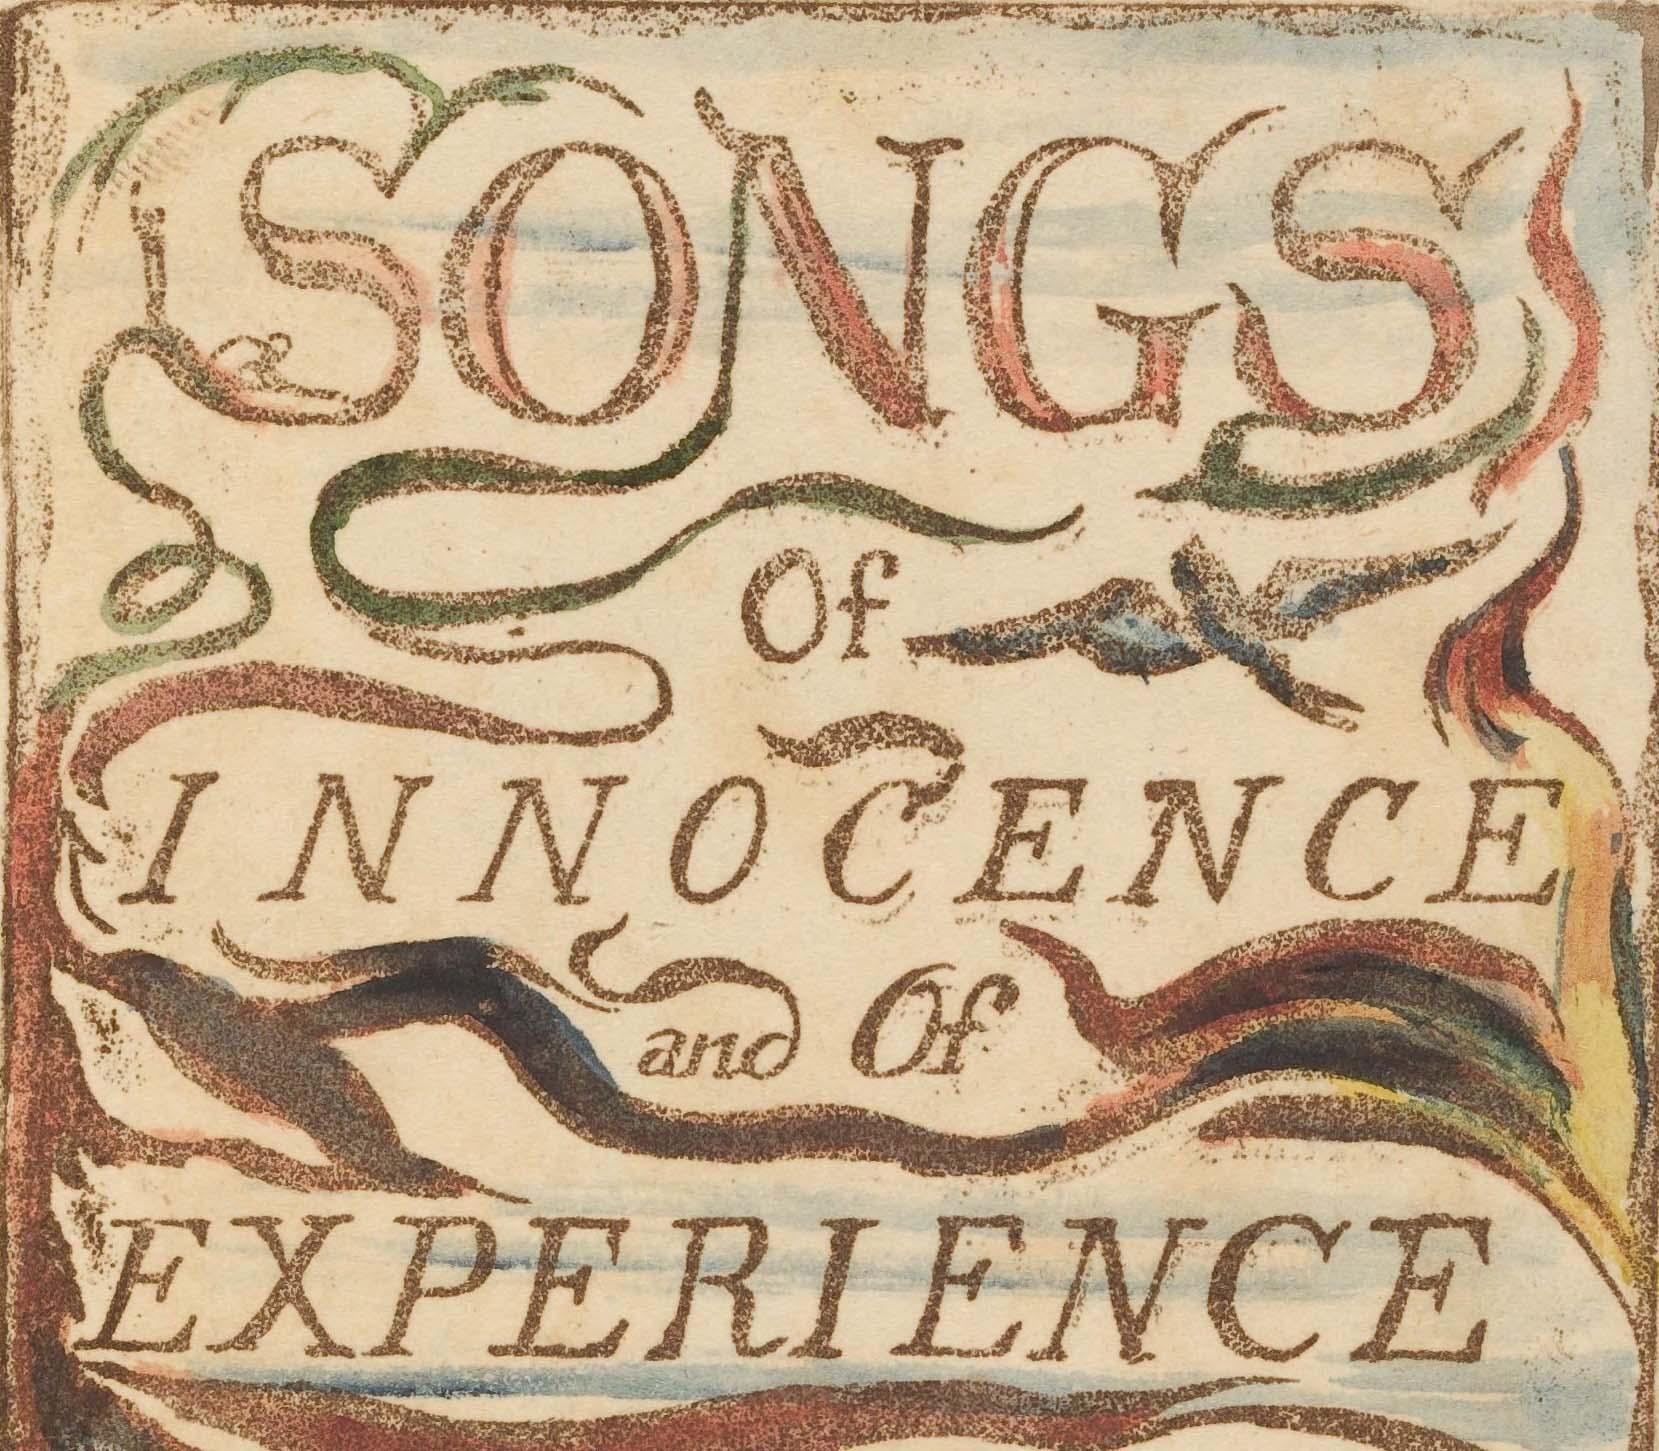 William Blake songs of innocence